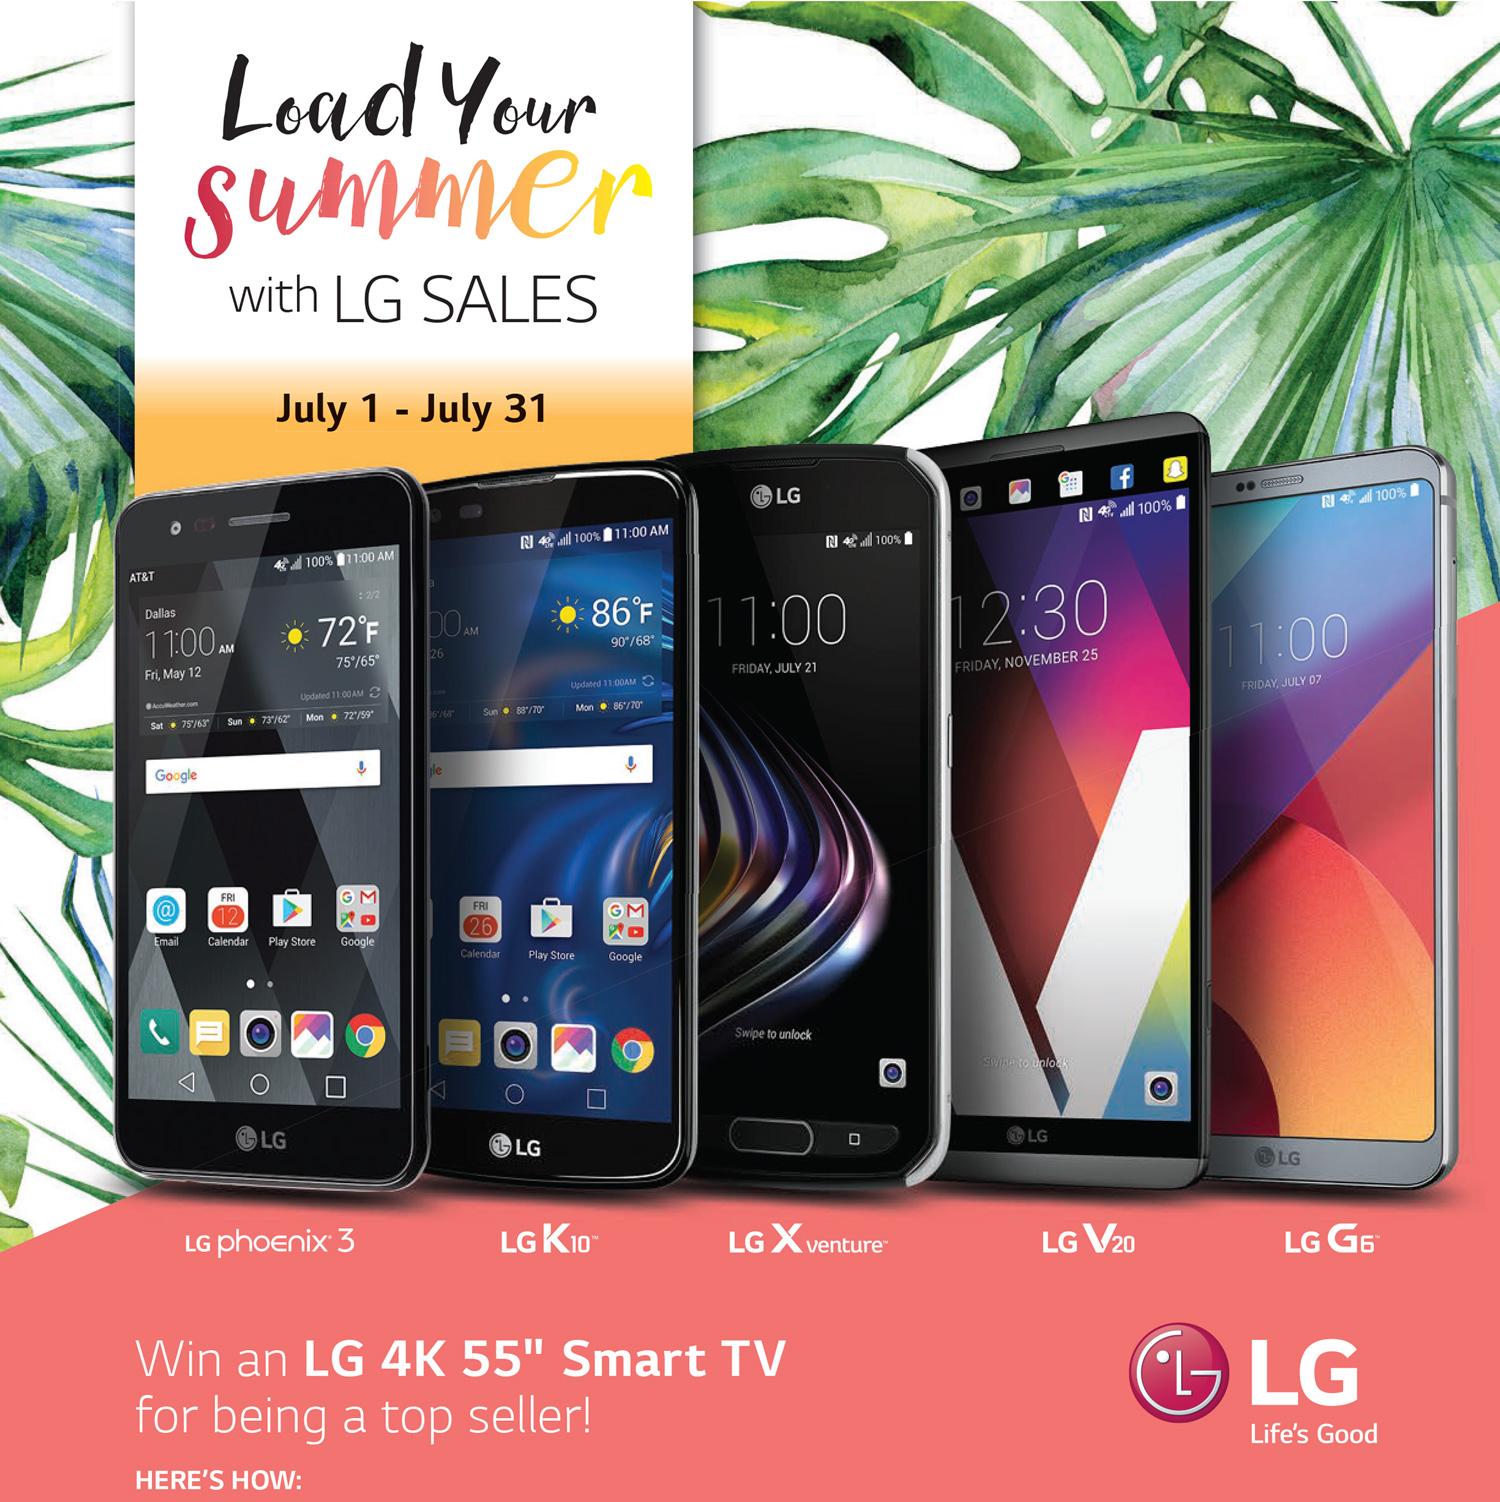 LG-Summer-promo (003).png